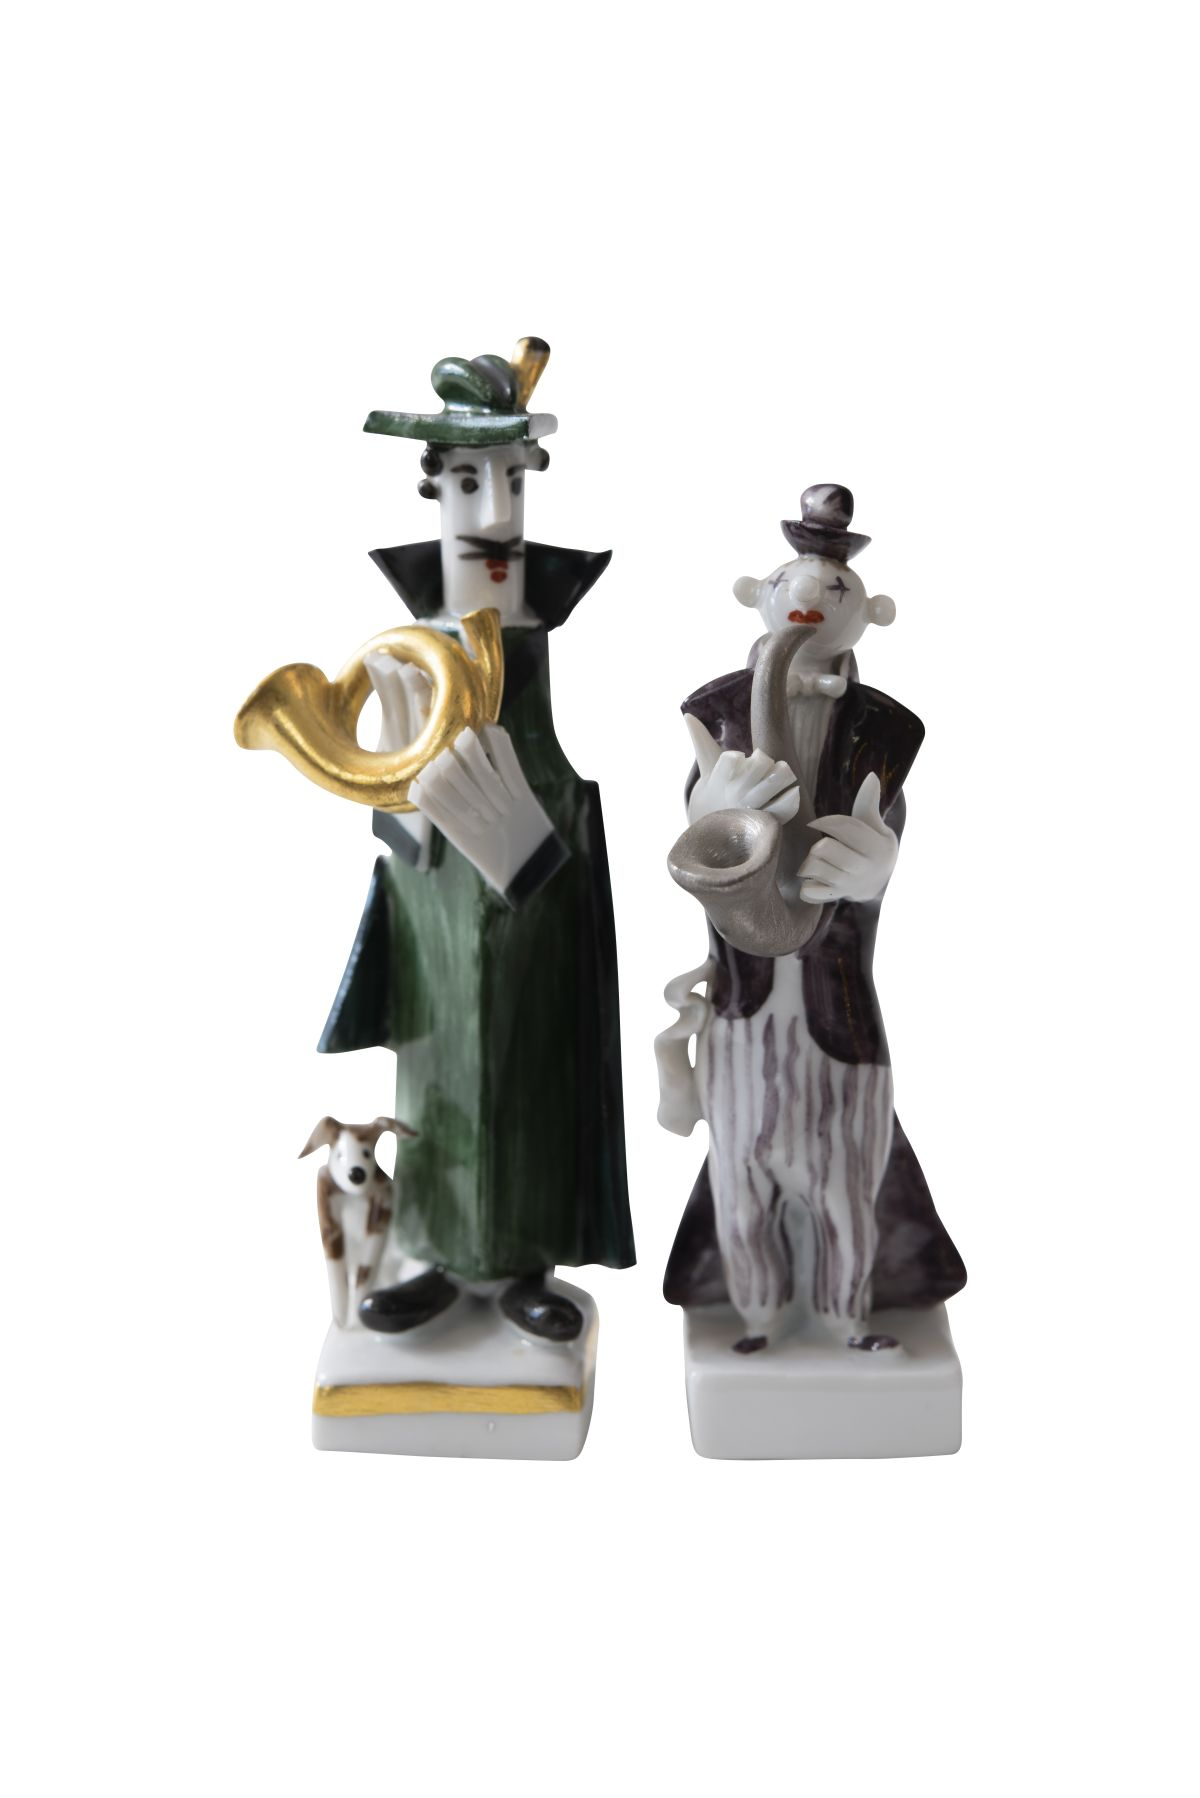 #122 2 porcelain figures Meissen 20th century | 2 Porzellan Figuren Meissen 20. Jahrhundert Image